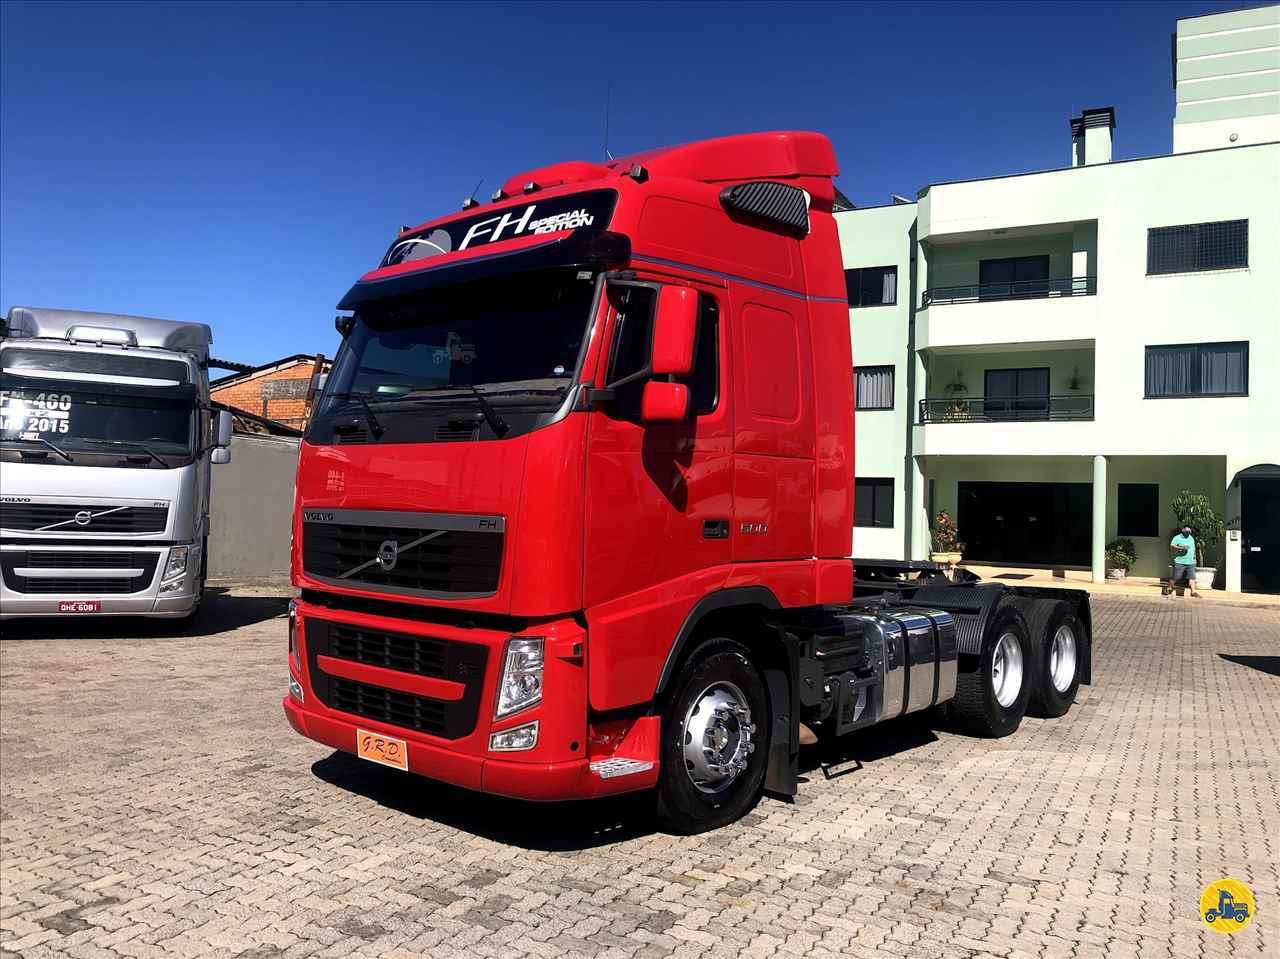 CAMINHAO VOLVO VOLVO FH 500 Cavalo Mecânico Truck 6x2 G.R.D. Caminhões CHAPECO SANTA CATARINA SC